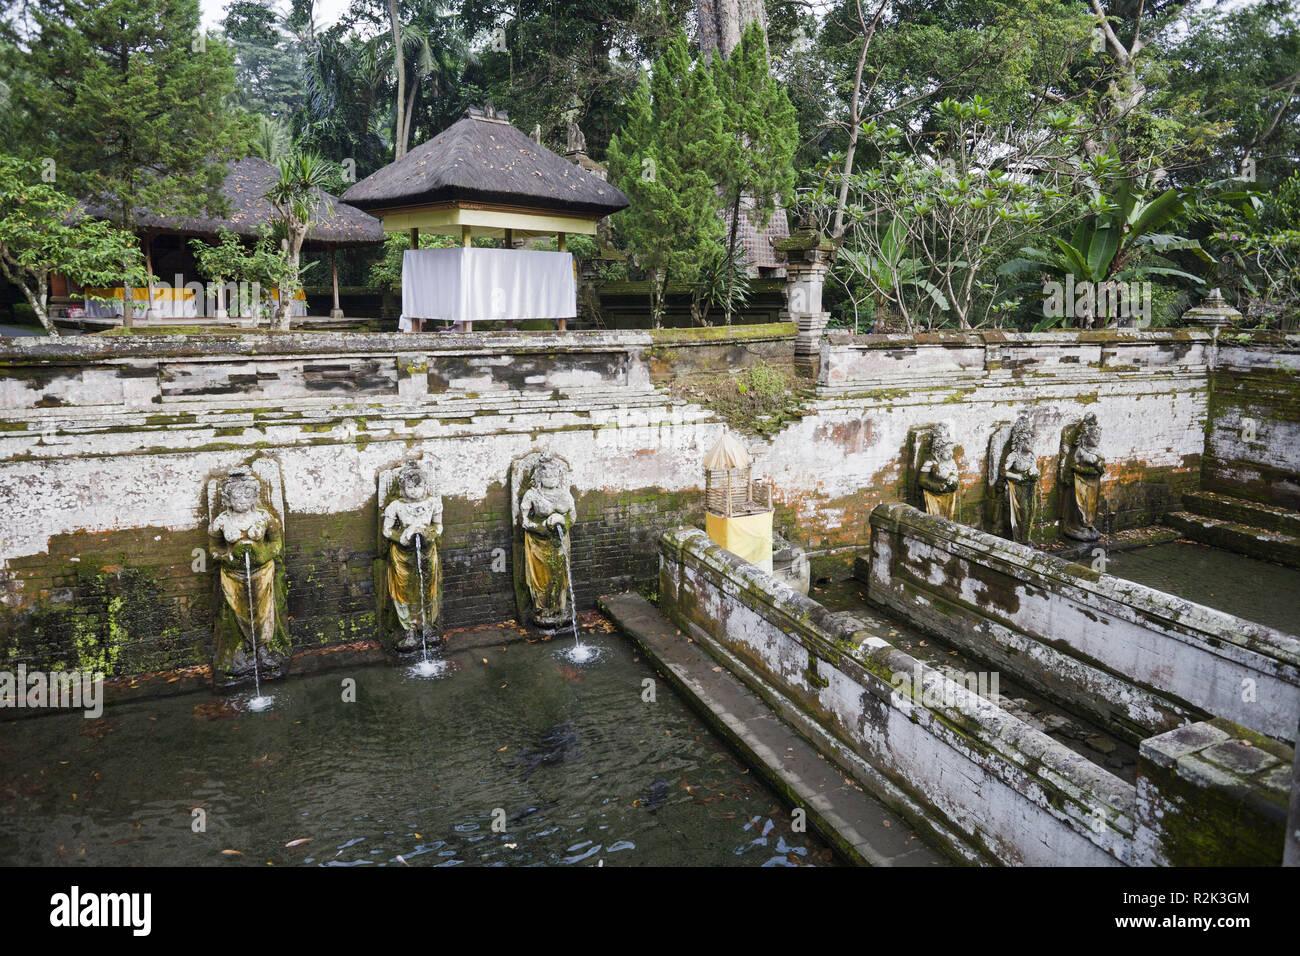 Indonesia, Bali, Ubud, temple 'Pura Goa Gajah', - Stock Image